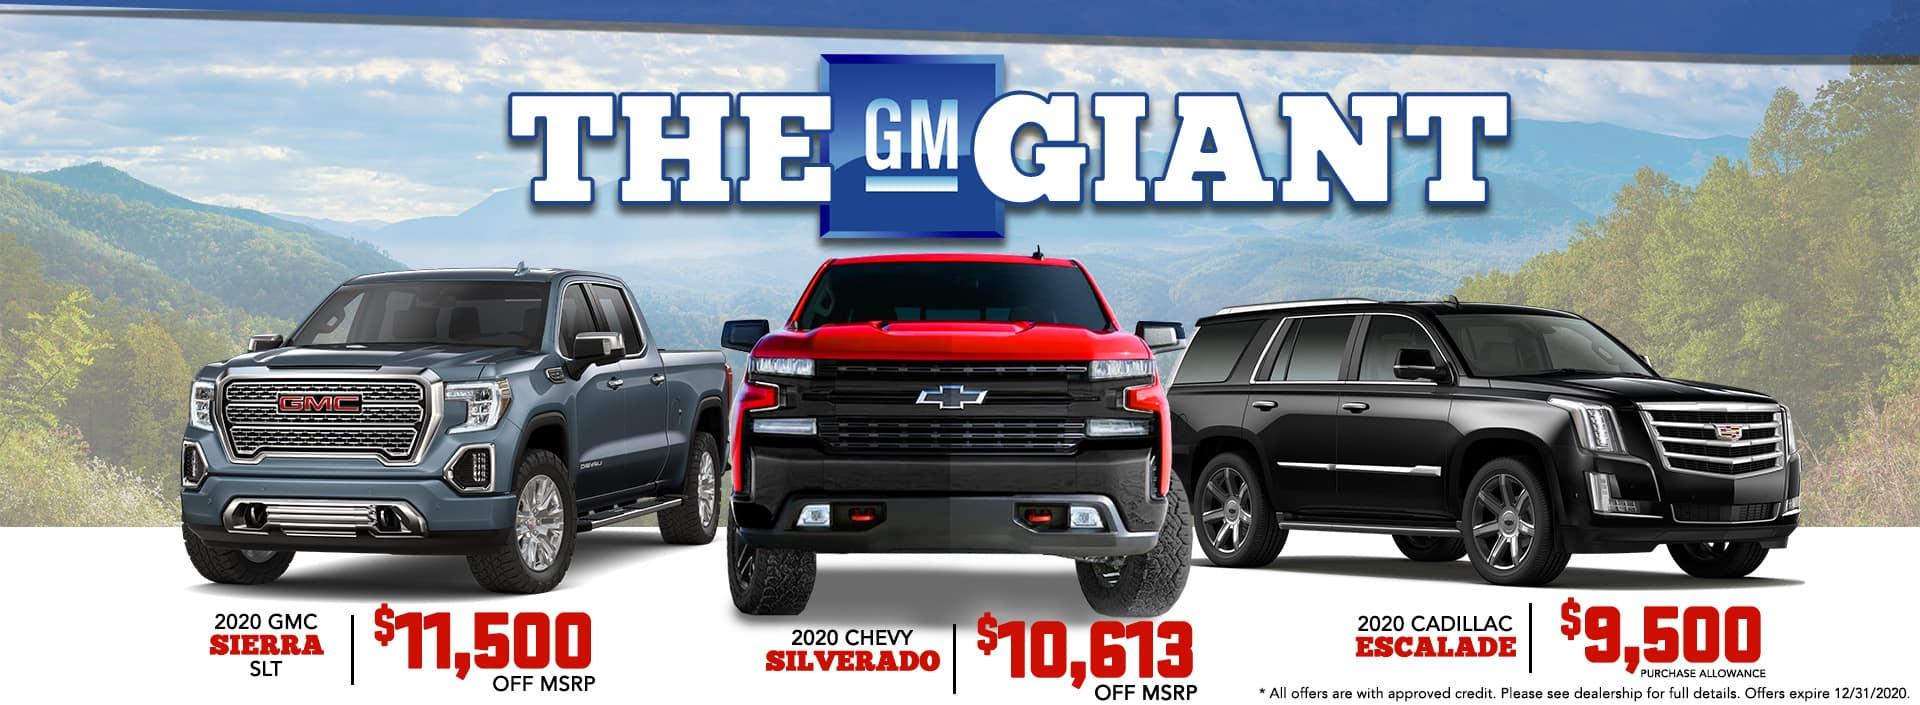 GM_Giant_004